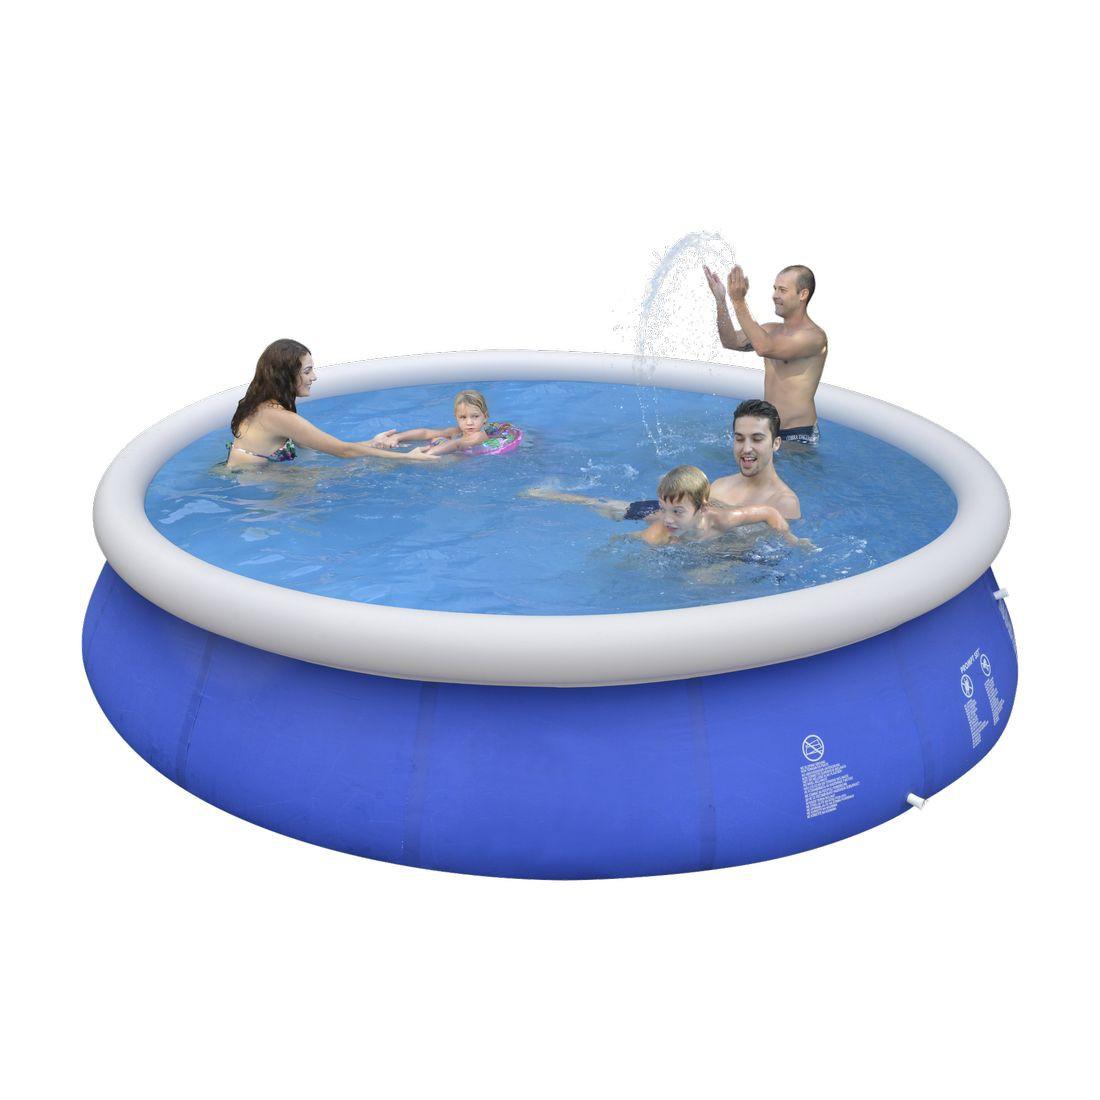 Jilong marin blue 450 quick up pool 450x90cm von jilong for Swimming pool ausverkauf